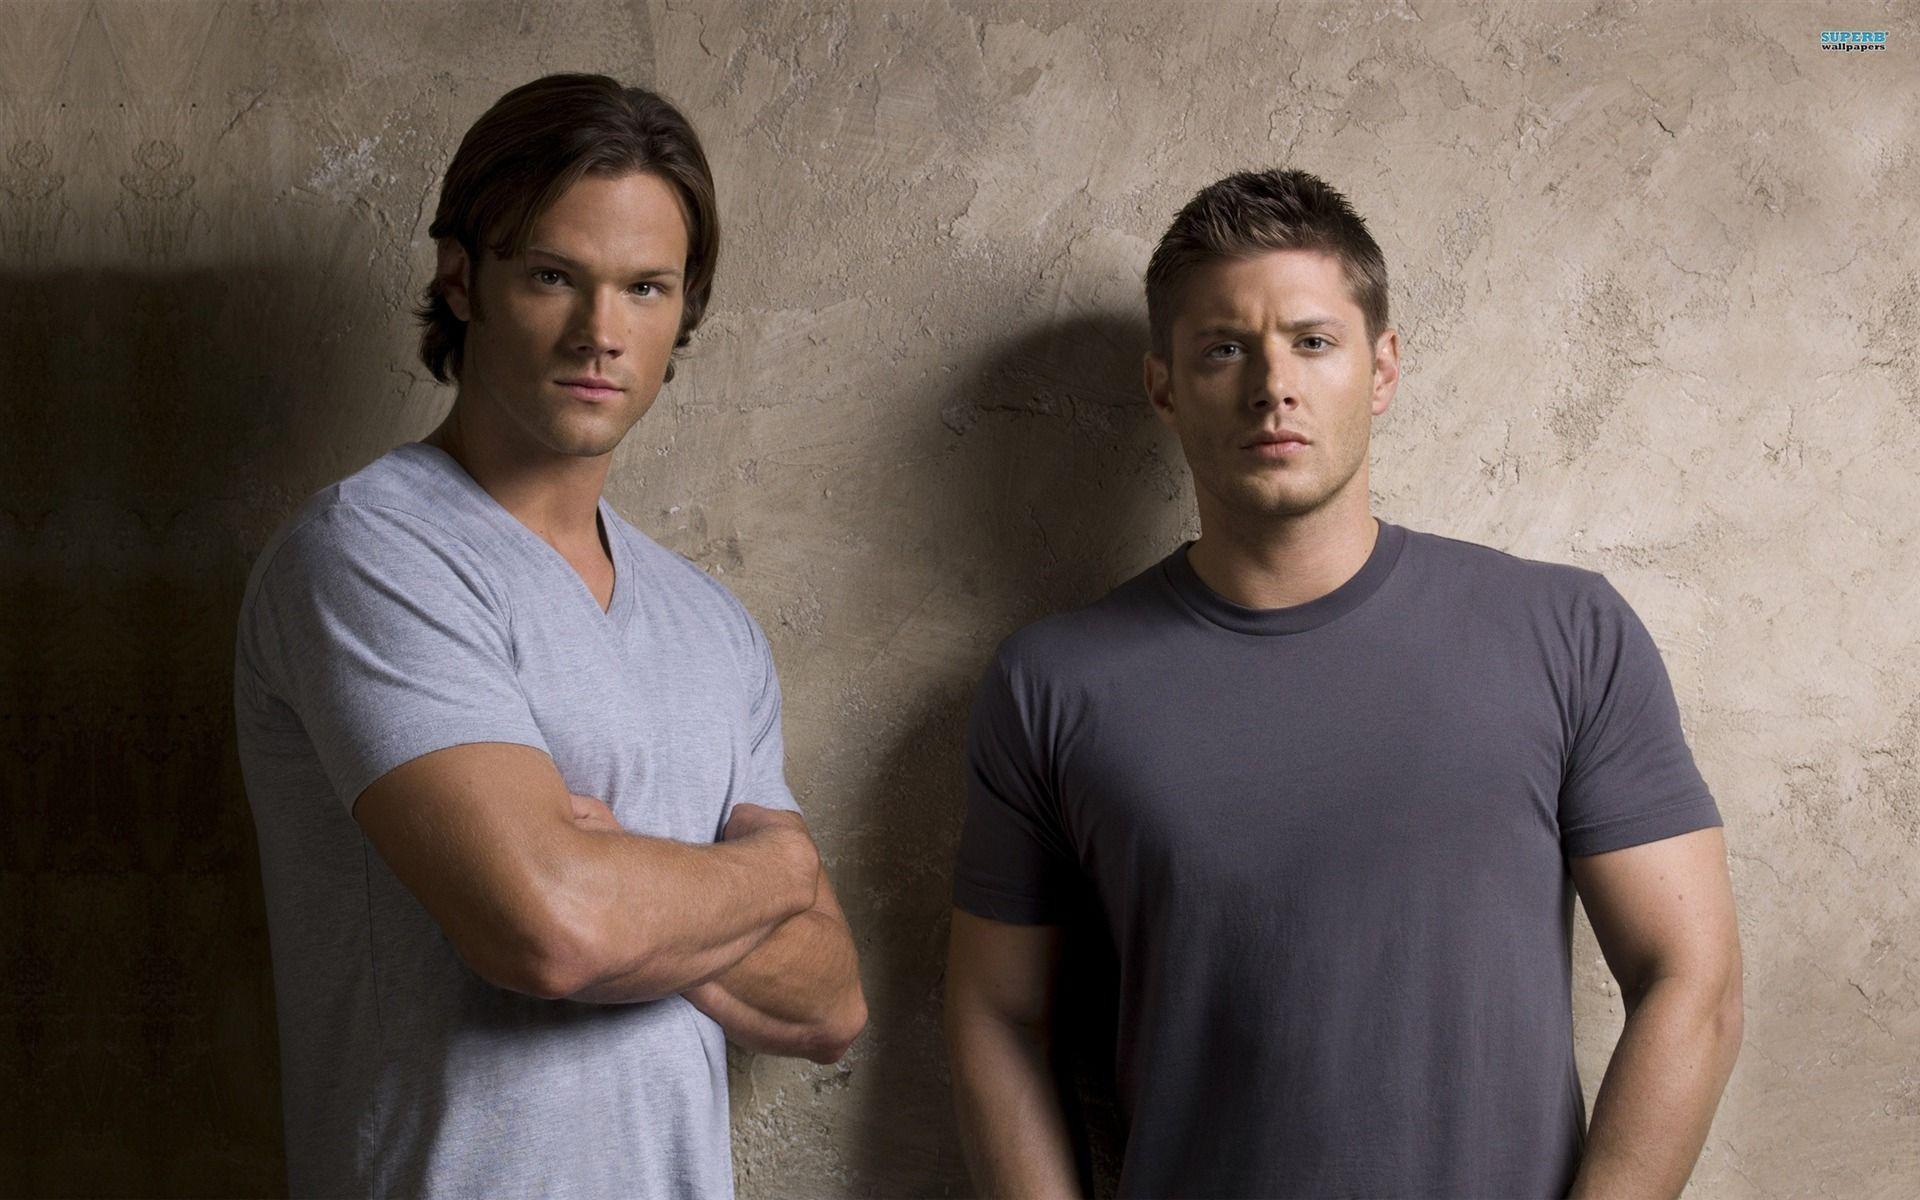 2560x1600 Supernatural Castiel Jensen Ackles Jared Padalecki Misha Collins Dean Winchester Sam Art HD Wallpaper